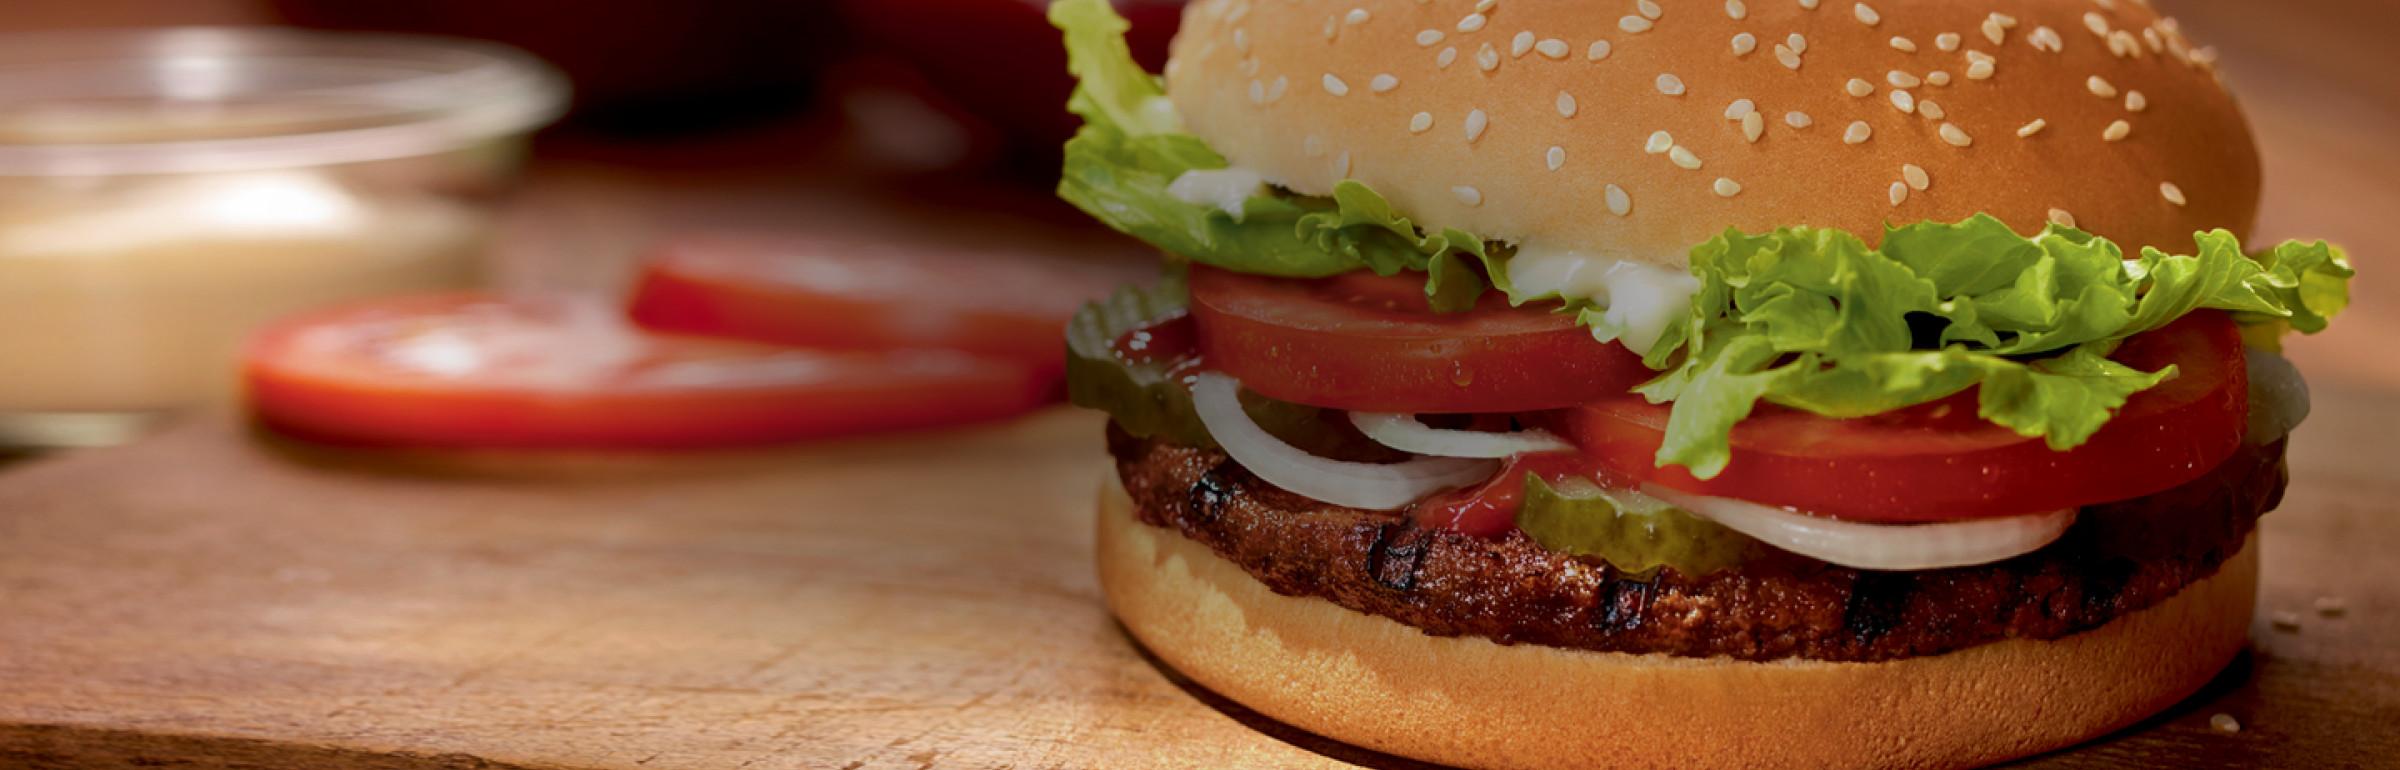 Banner Burger King